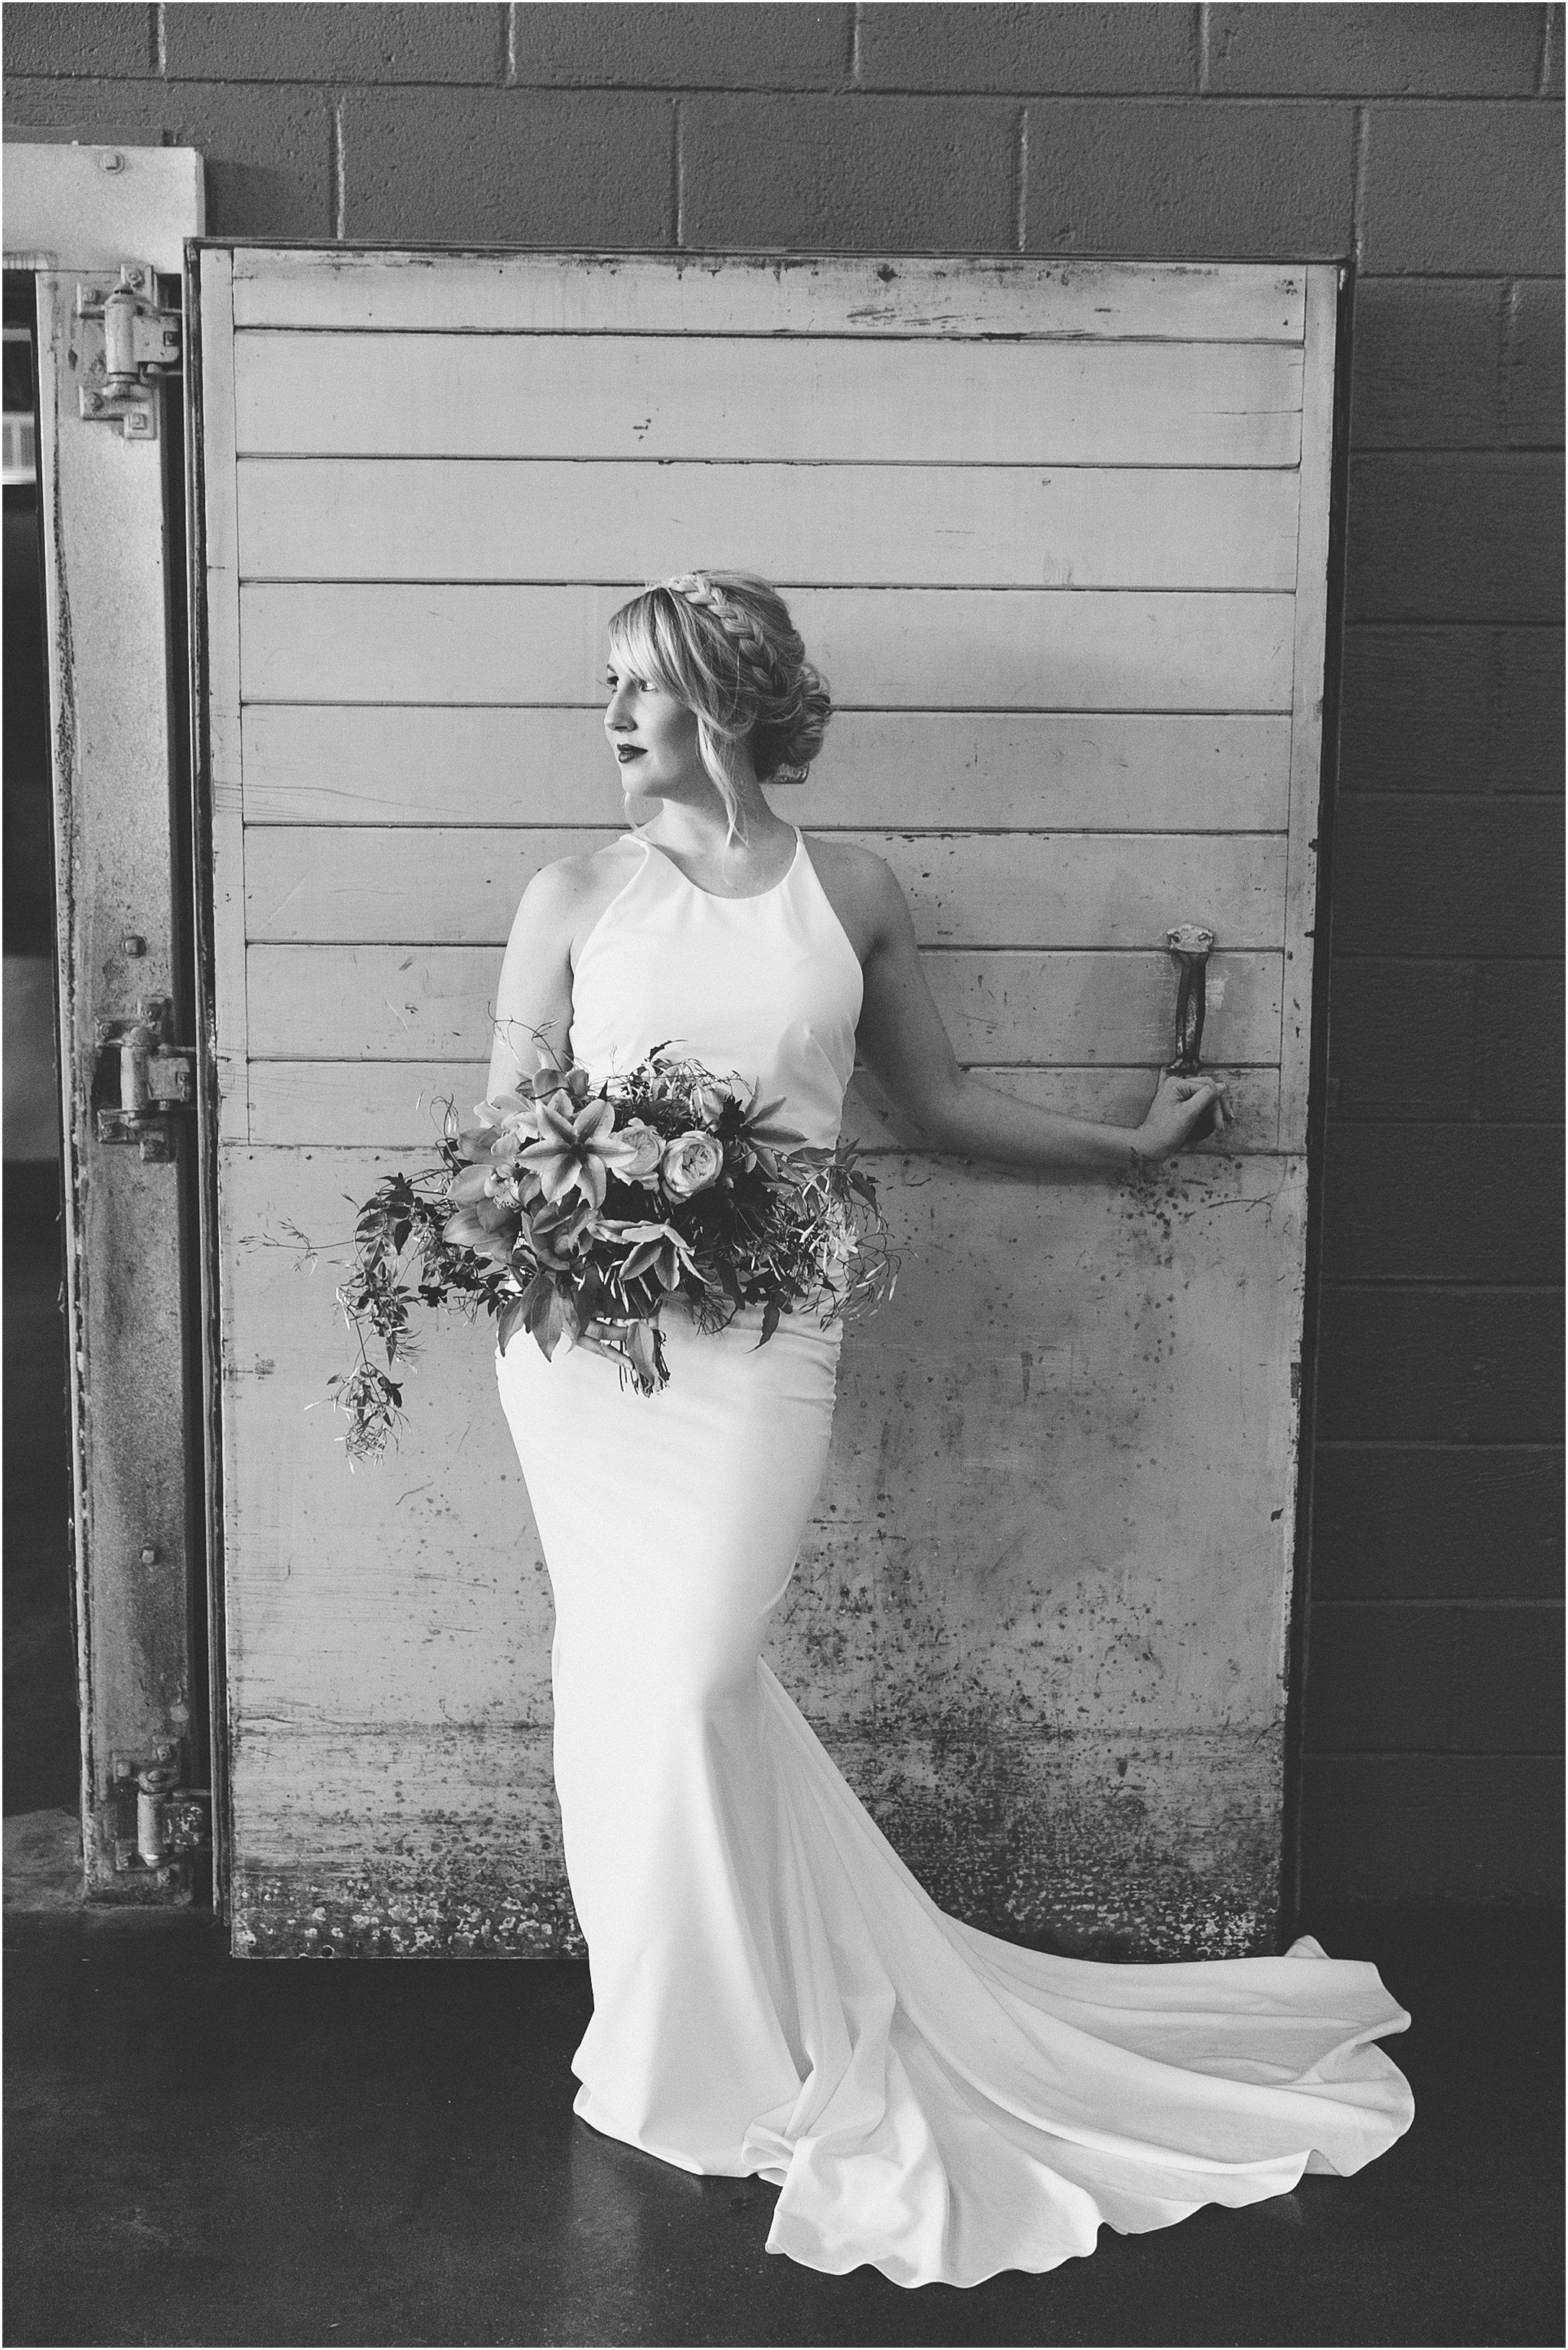 jessica_ryan_photography_oconnor_brewing_wedding_oconnor_brewing_co_norfolk_virginia_roost_flowers_blue_birds_garage__0820